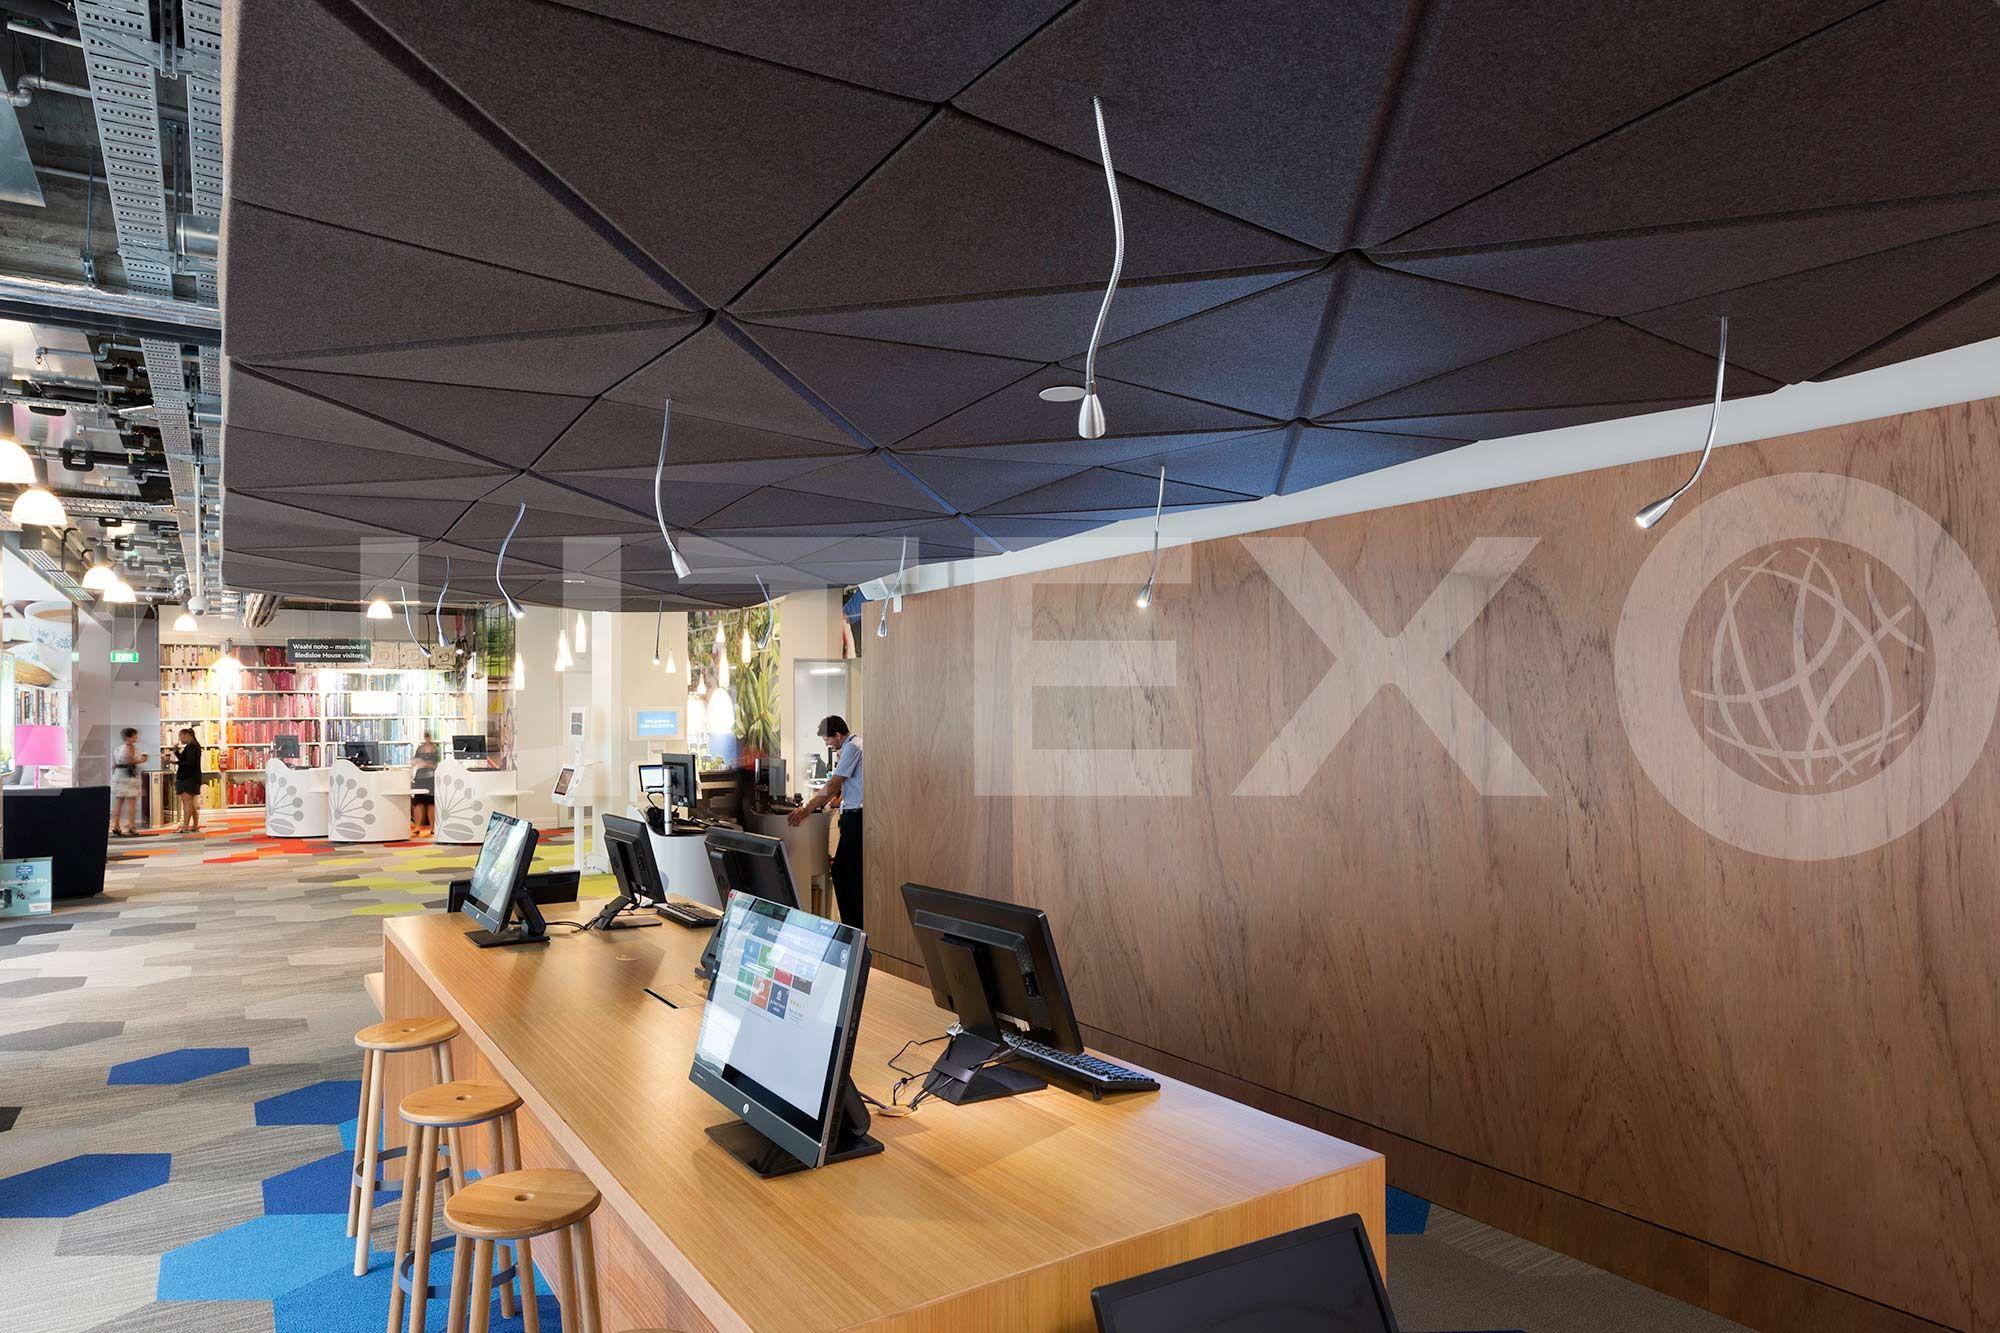 Autex interior acoustics quietspace 3d ceiling tiles auckland autex interior acoustics quietspace 3d ceiling tiles auckland city council nz dailygadgetfo Choice Image